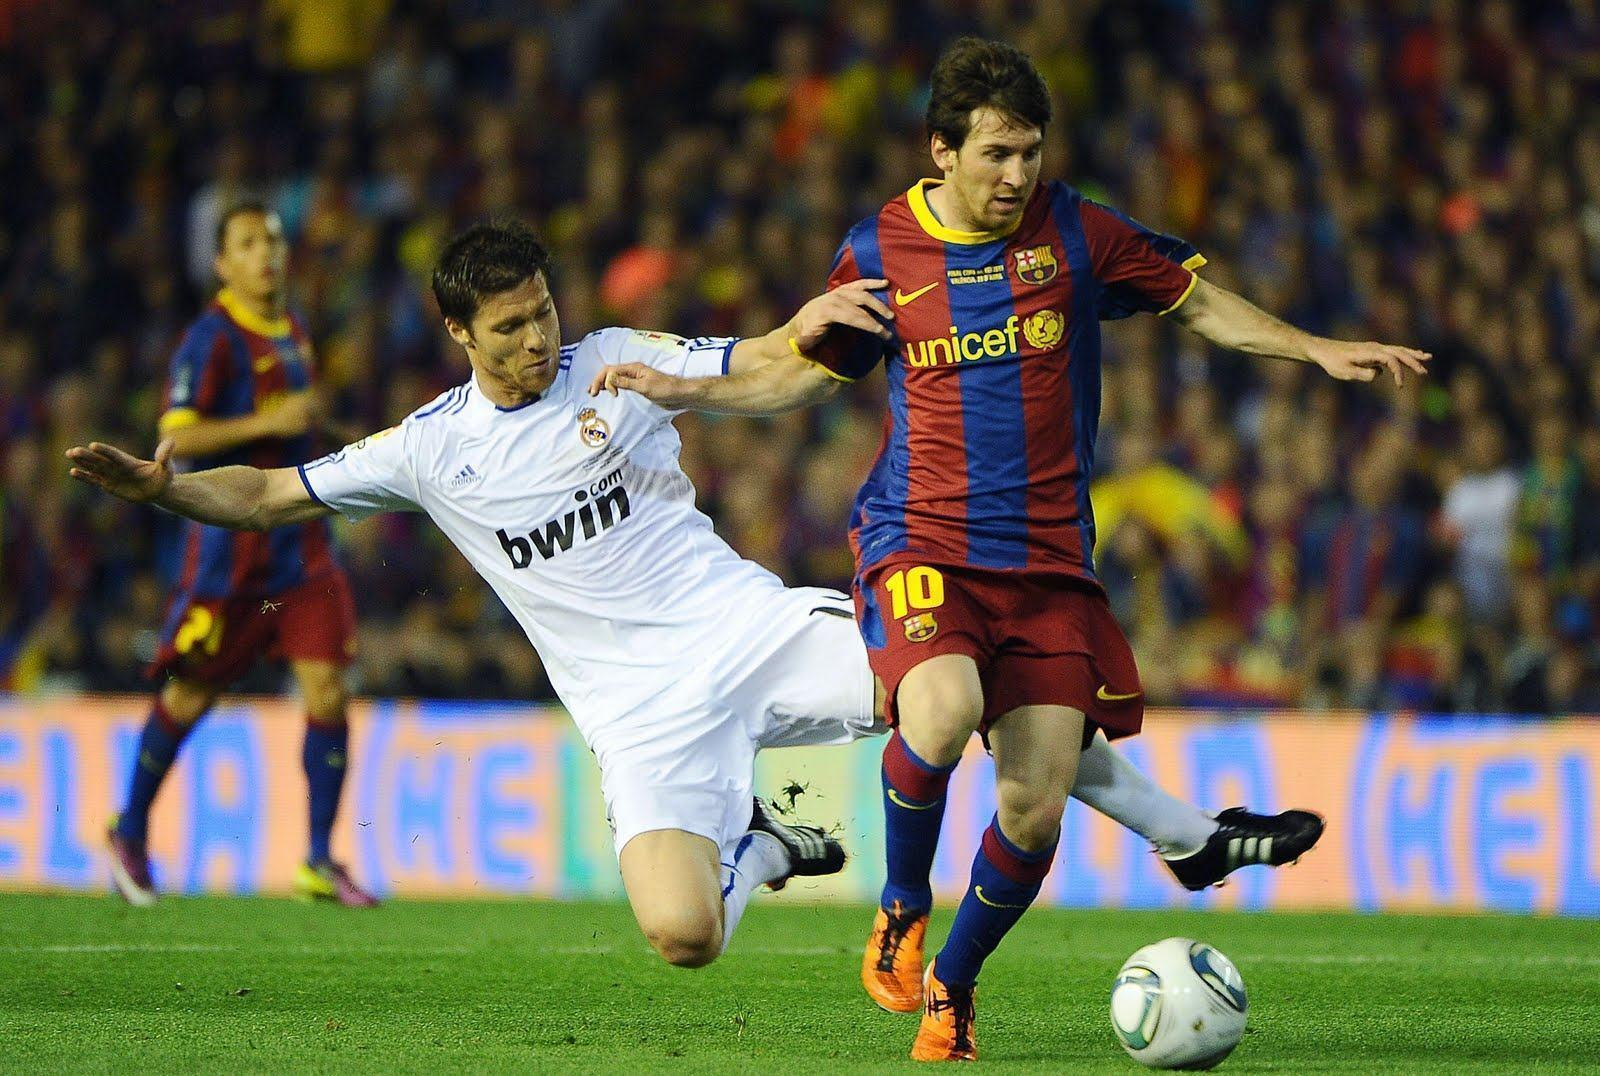 C Ronaldo Vs Messi Wallpapers 2016 - Wallpaper Cave